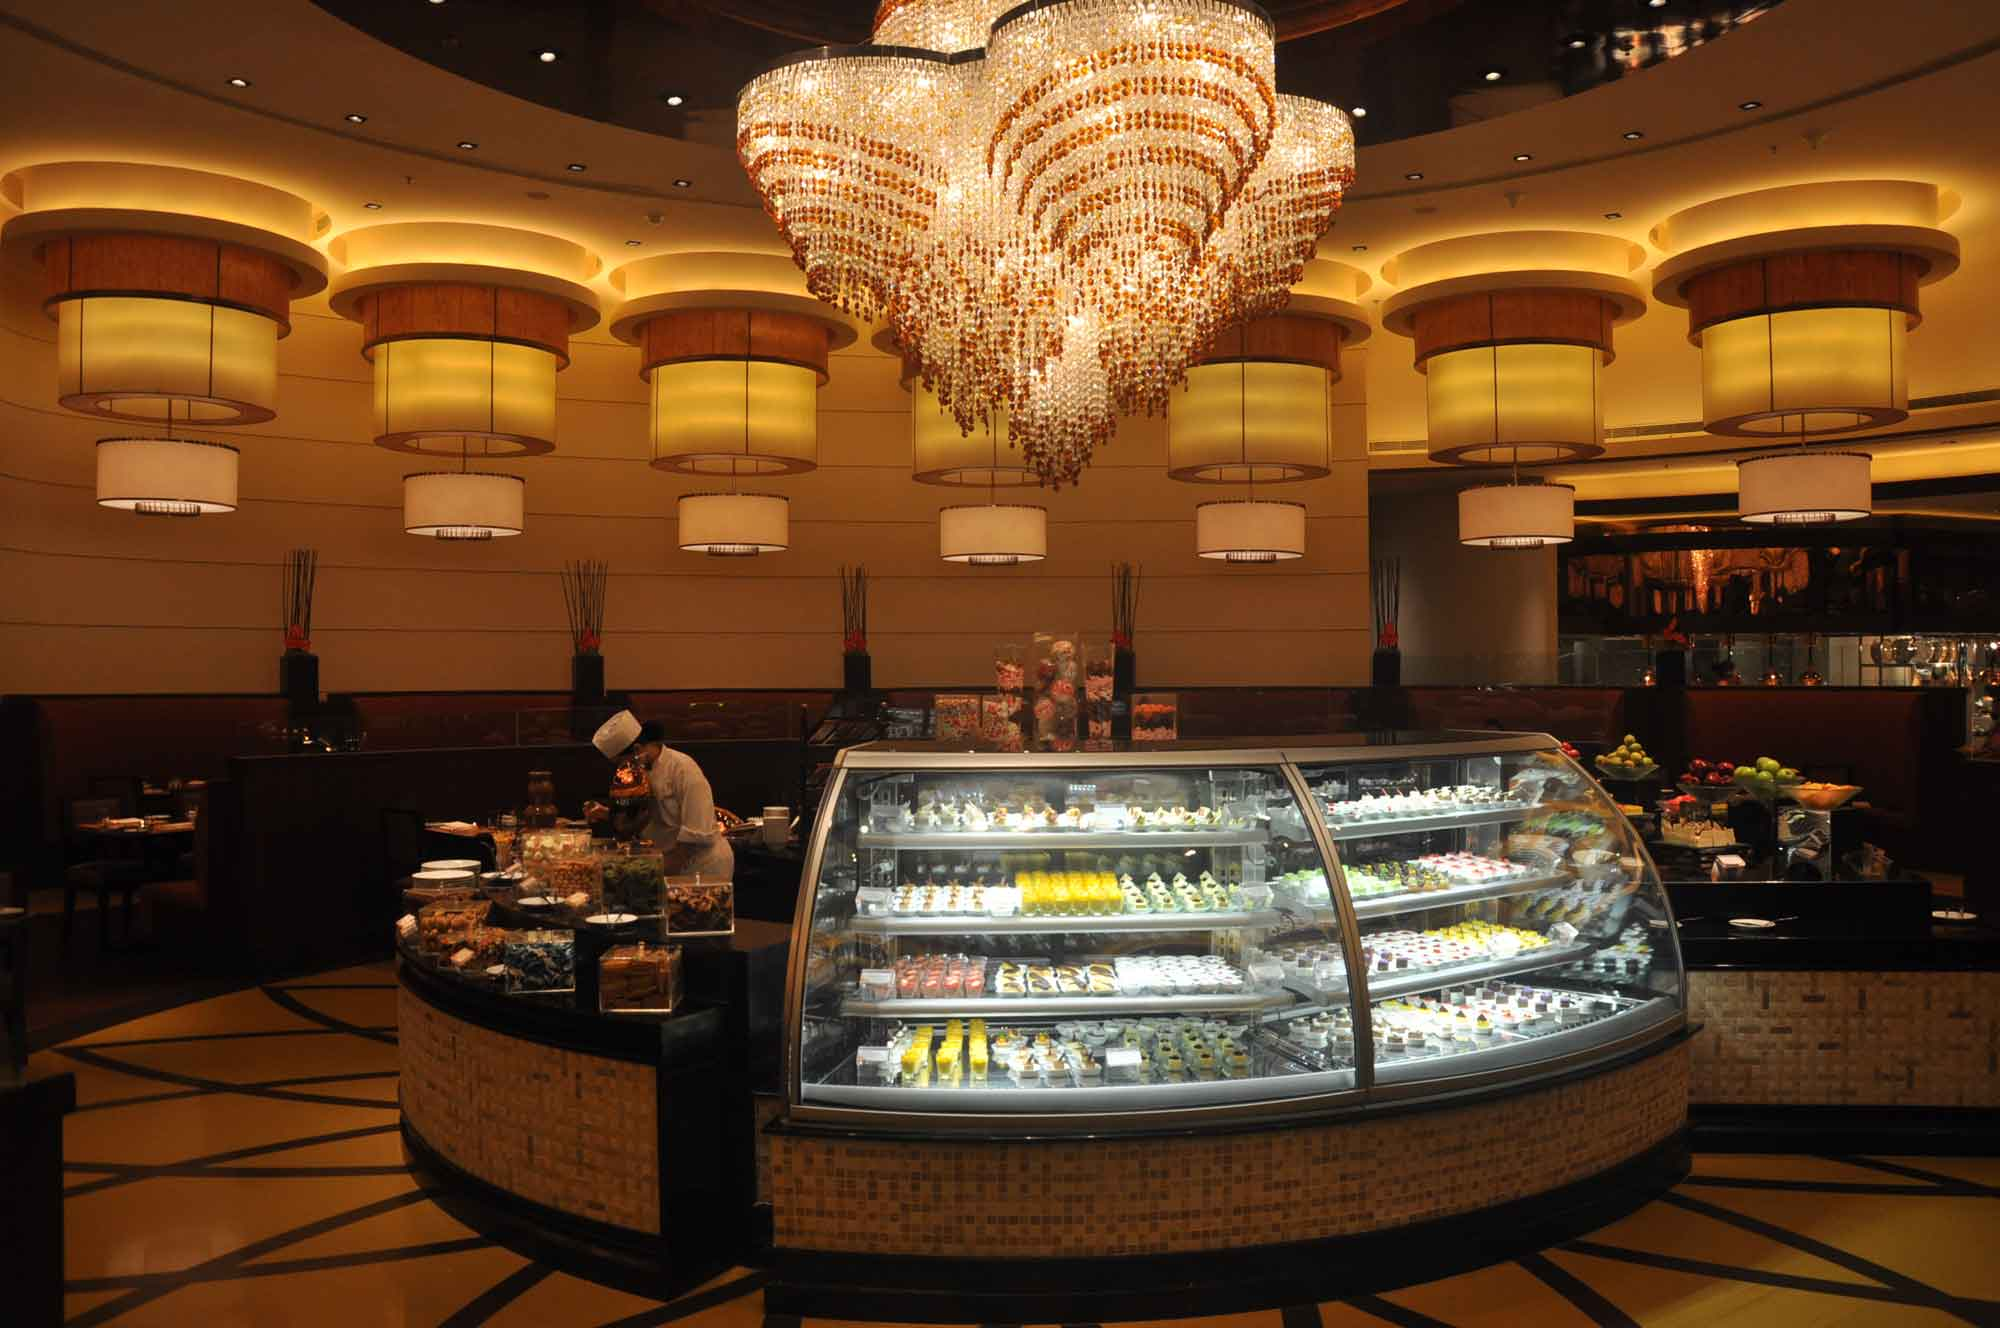 Grand Orbit Macau dessert station